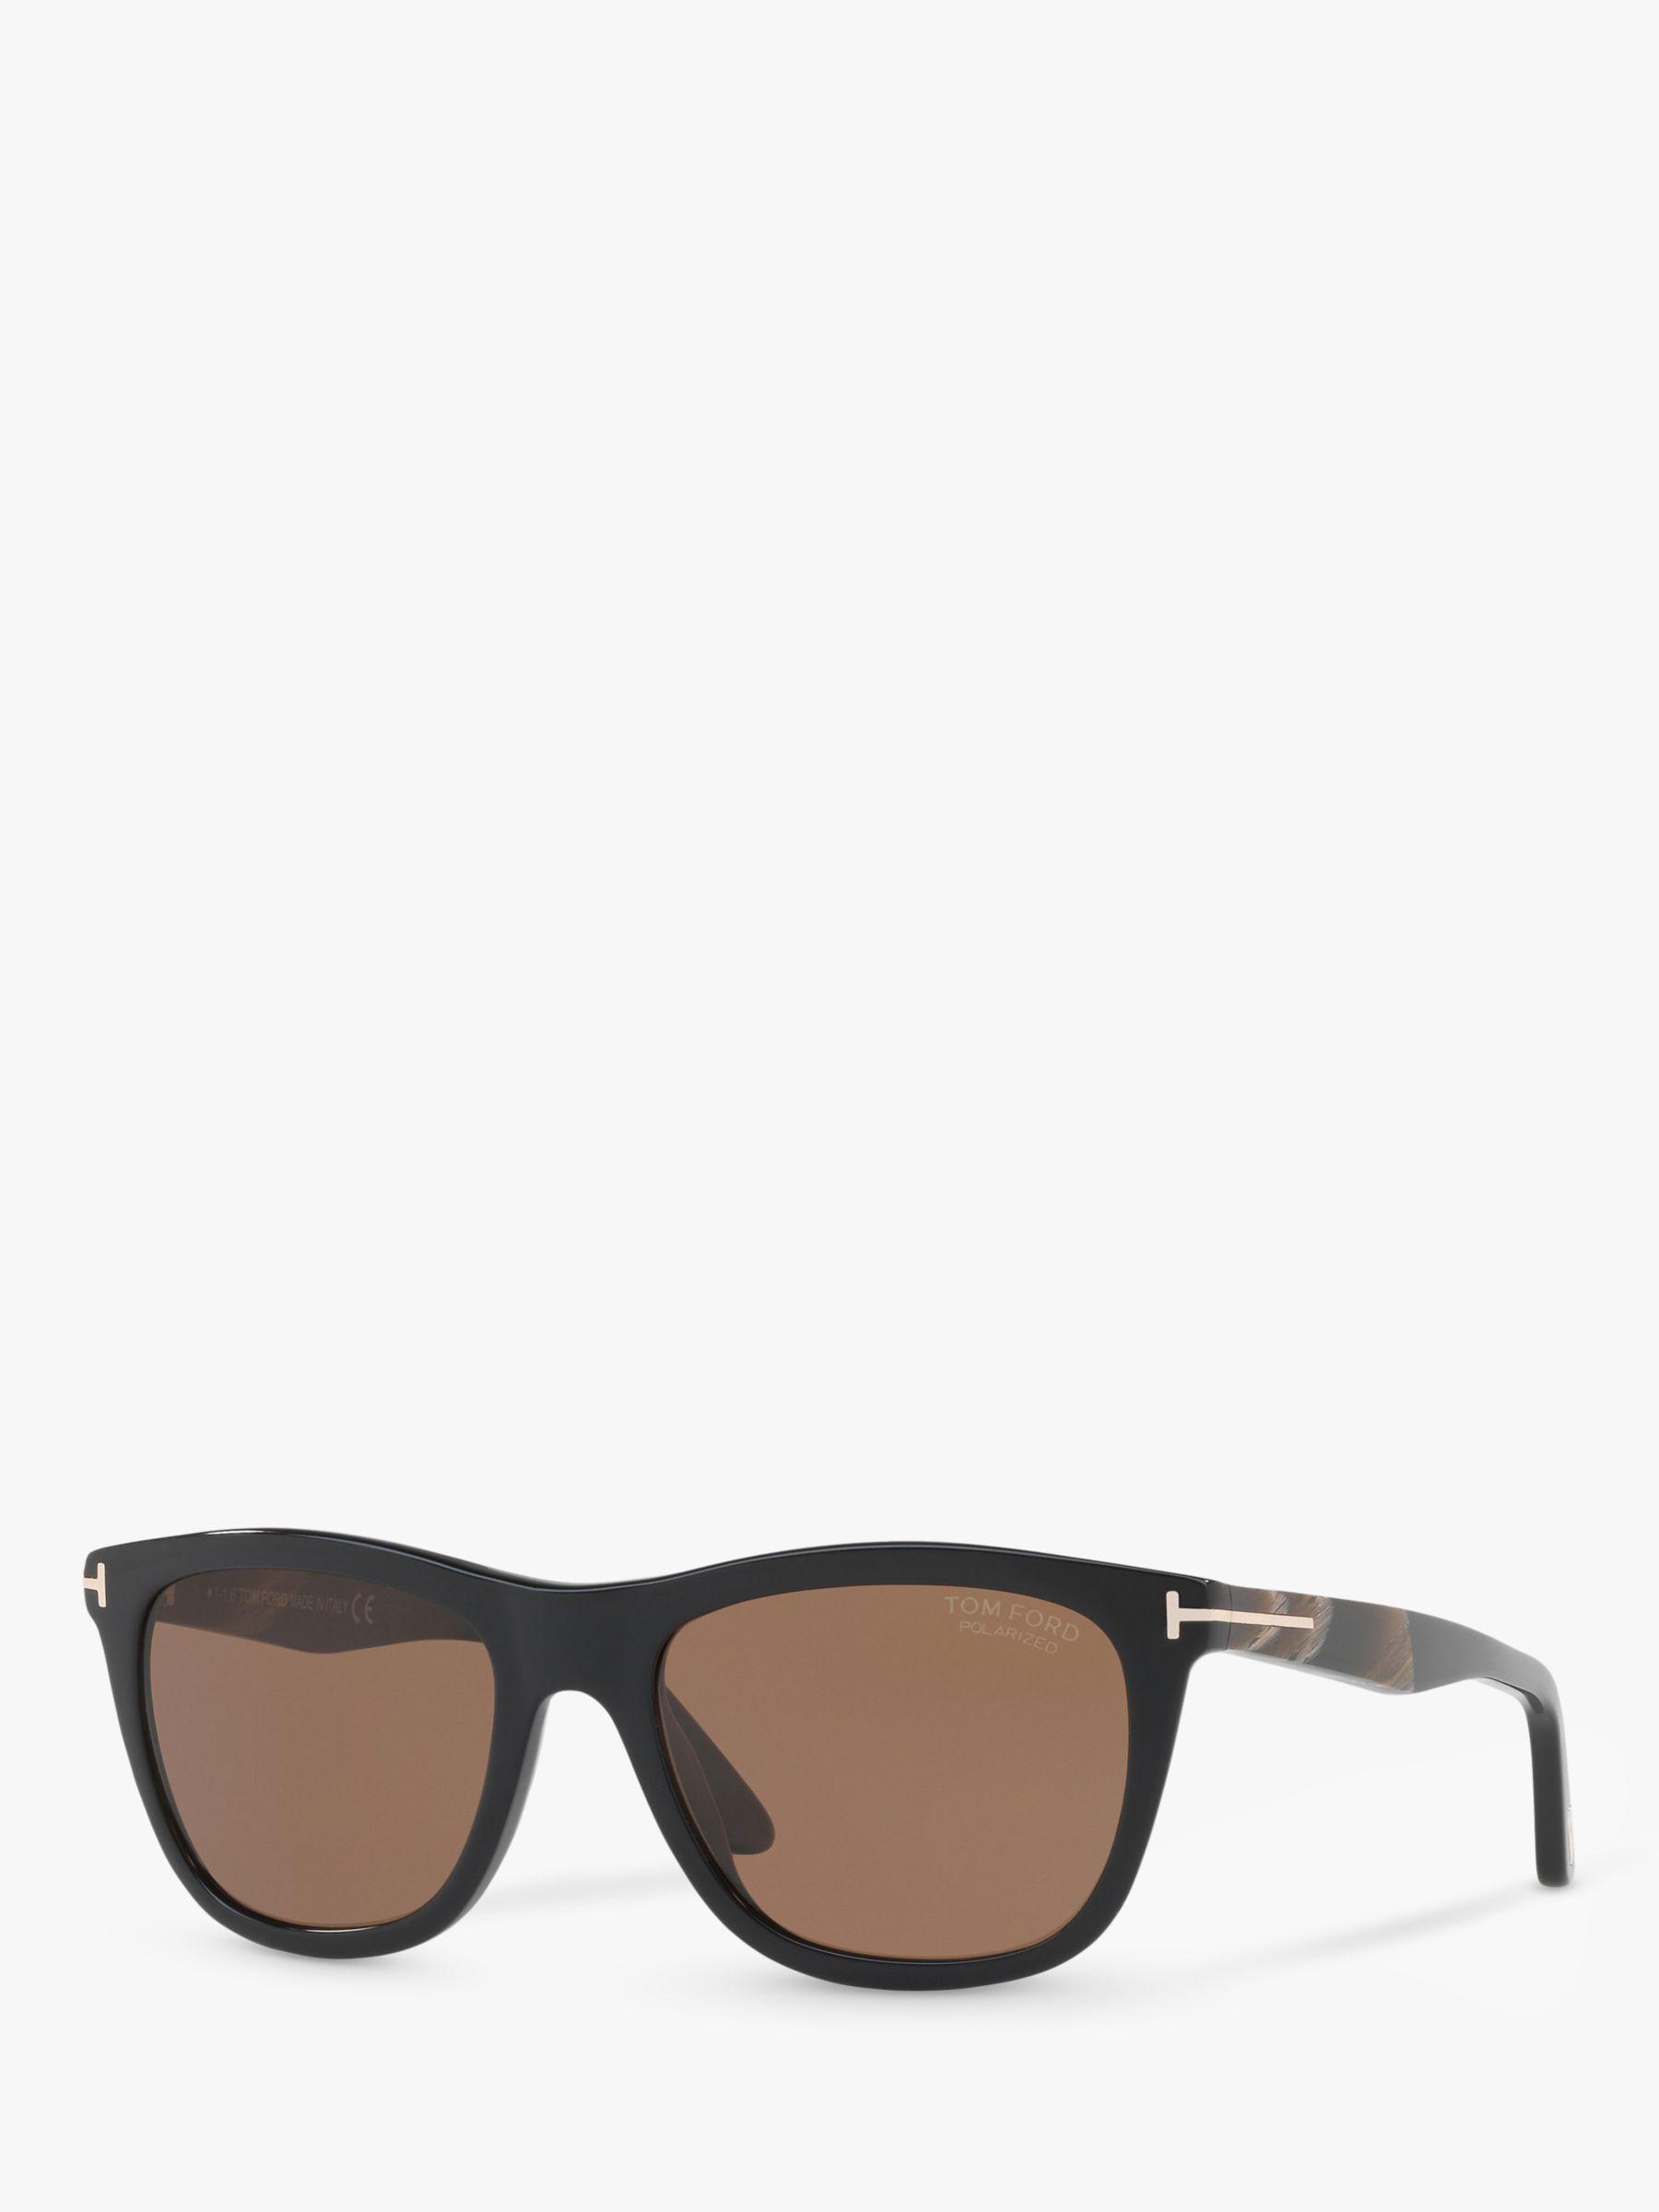 Tom Ford TOM FORD FT0500 Andrew Polarised Square Sunglasses, Black/Brown